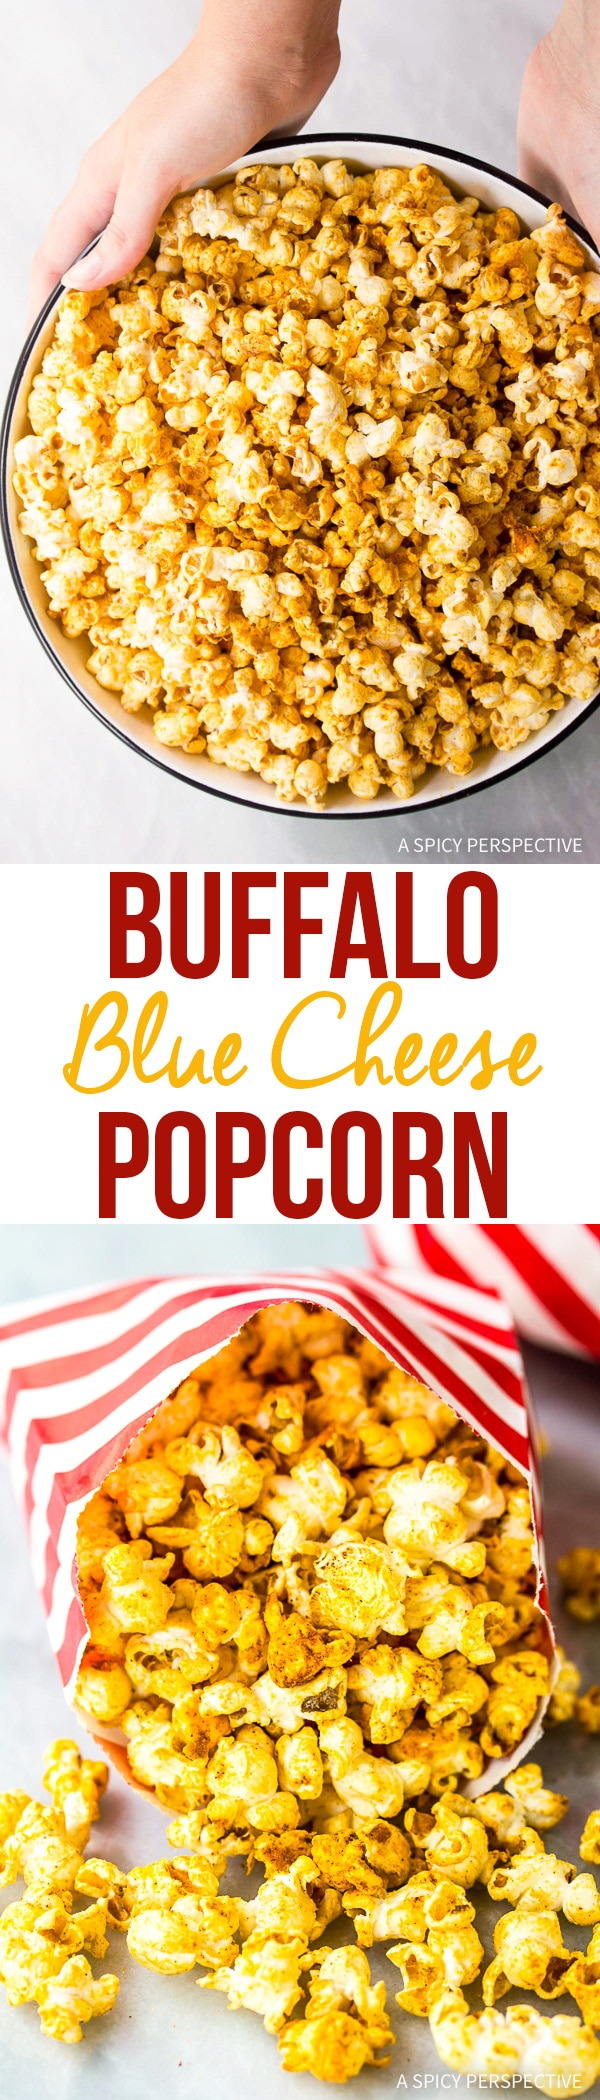 Zesty Buffalo Blue Cheese Popcorn Recipe